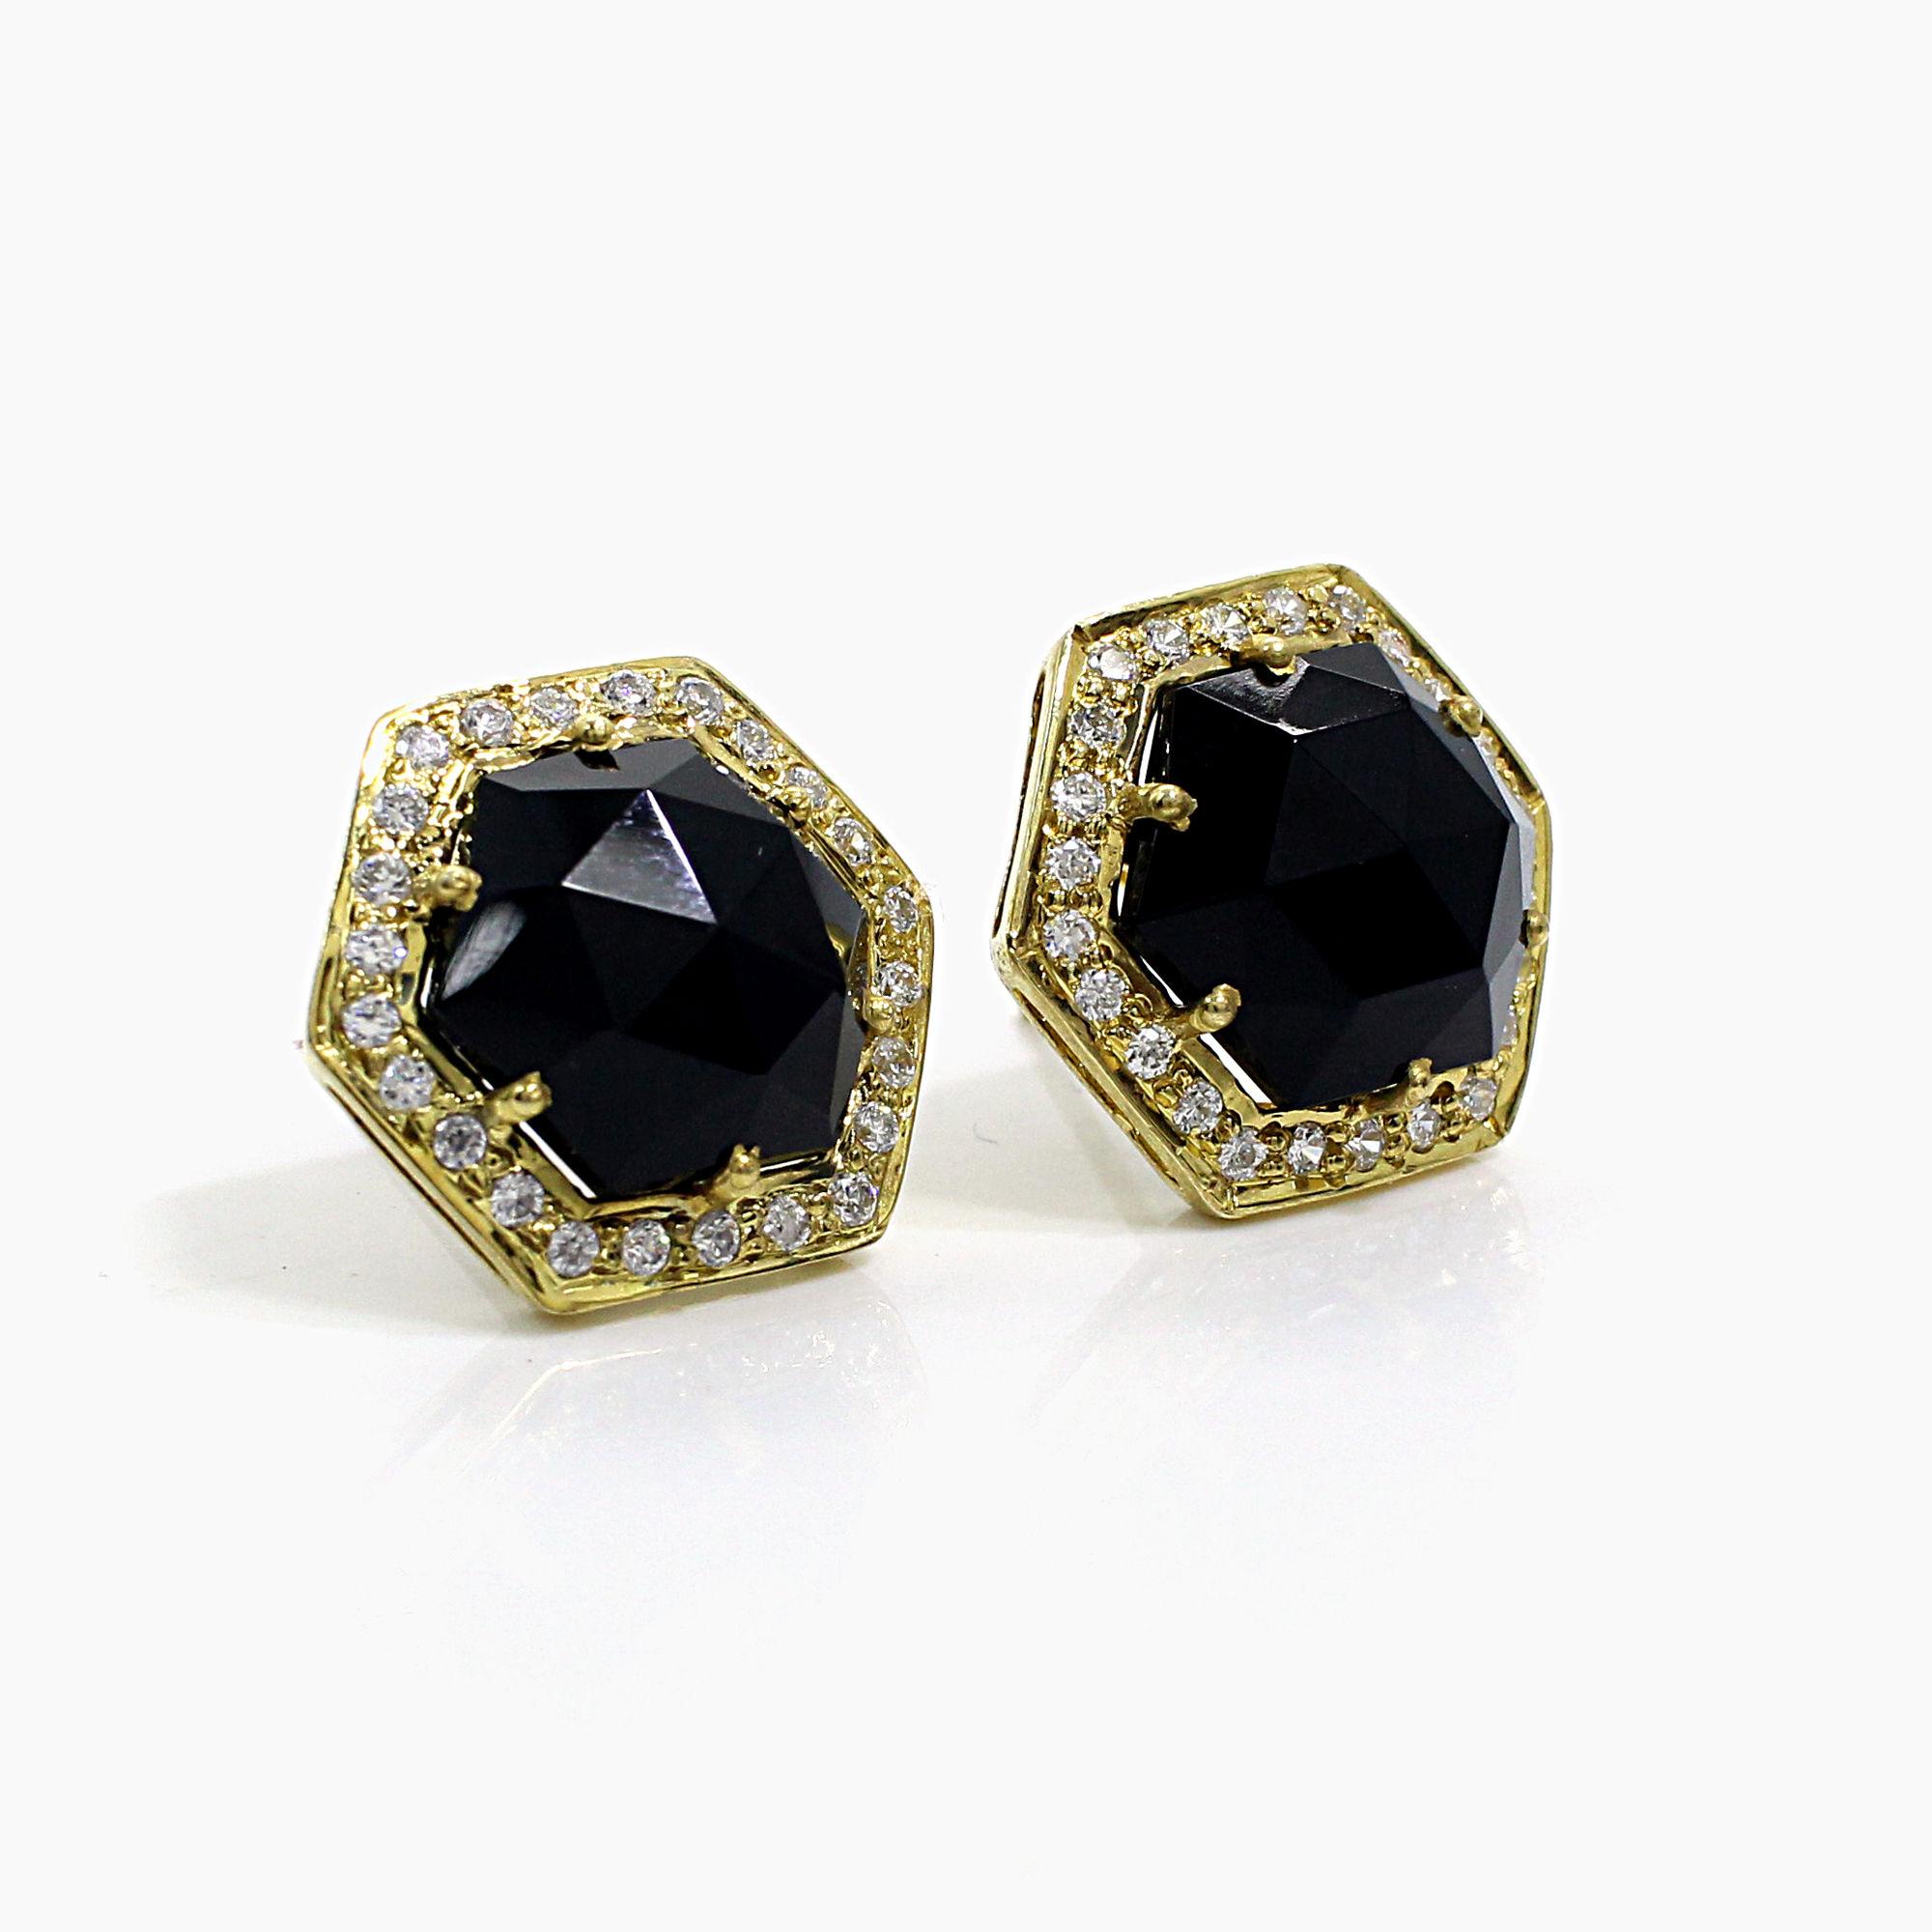 Black Onyx with CZ Silver Stud Earrings